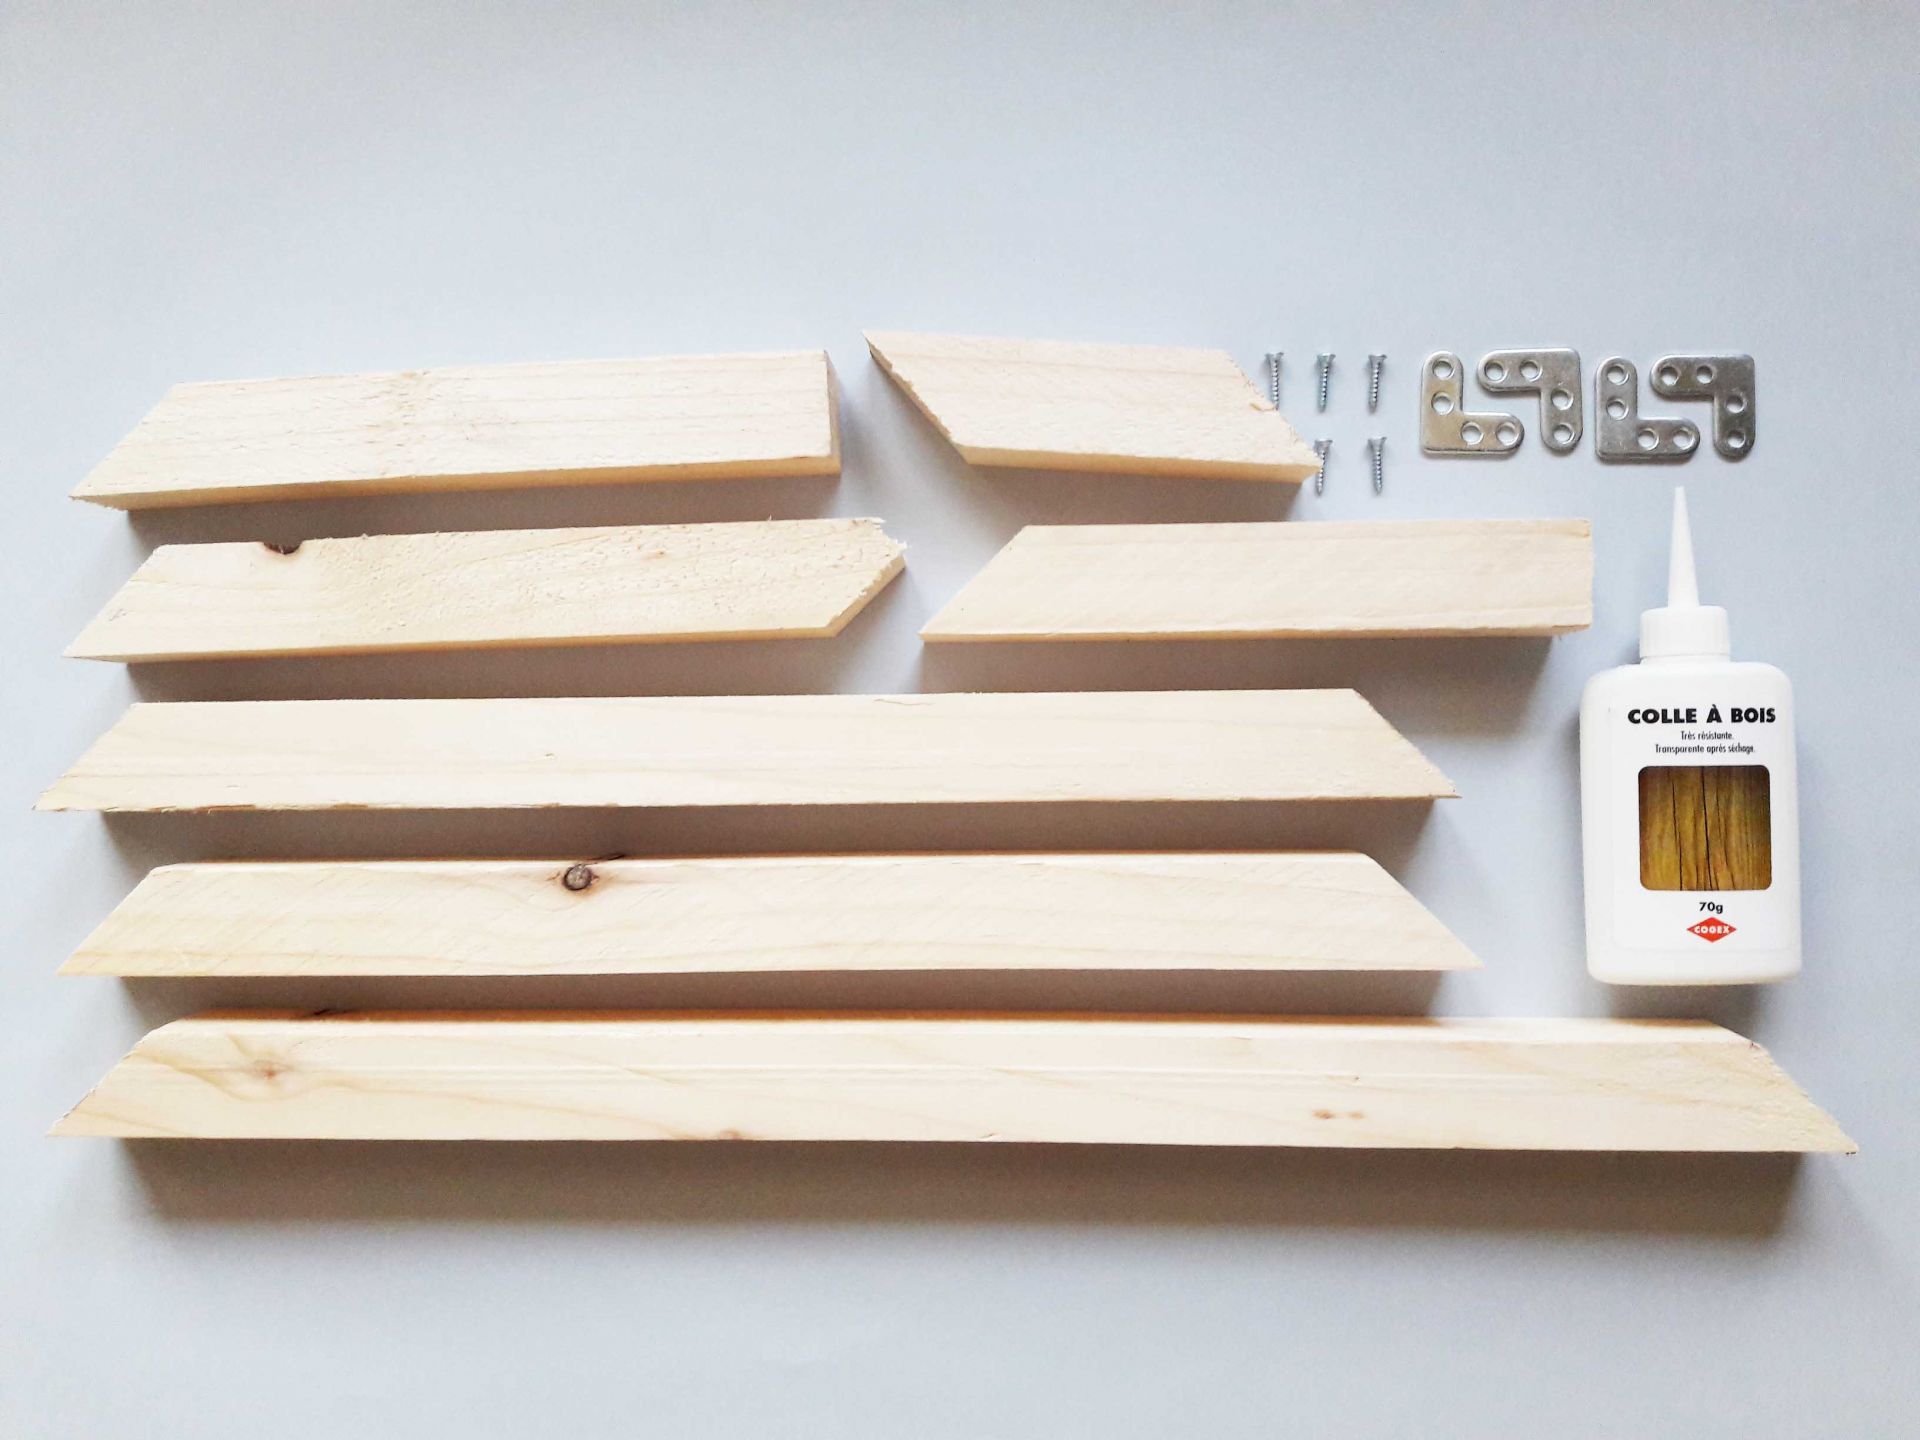 diy cadre en bois lo cia itr ma. Black Bedroom Furniture Sets. Home Design Ideas